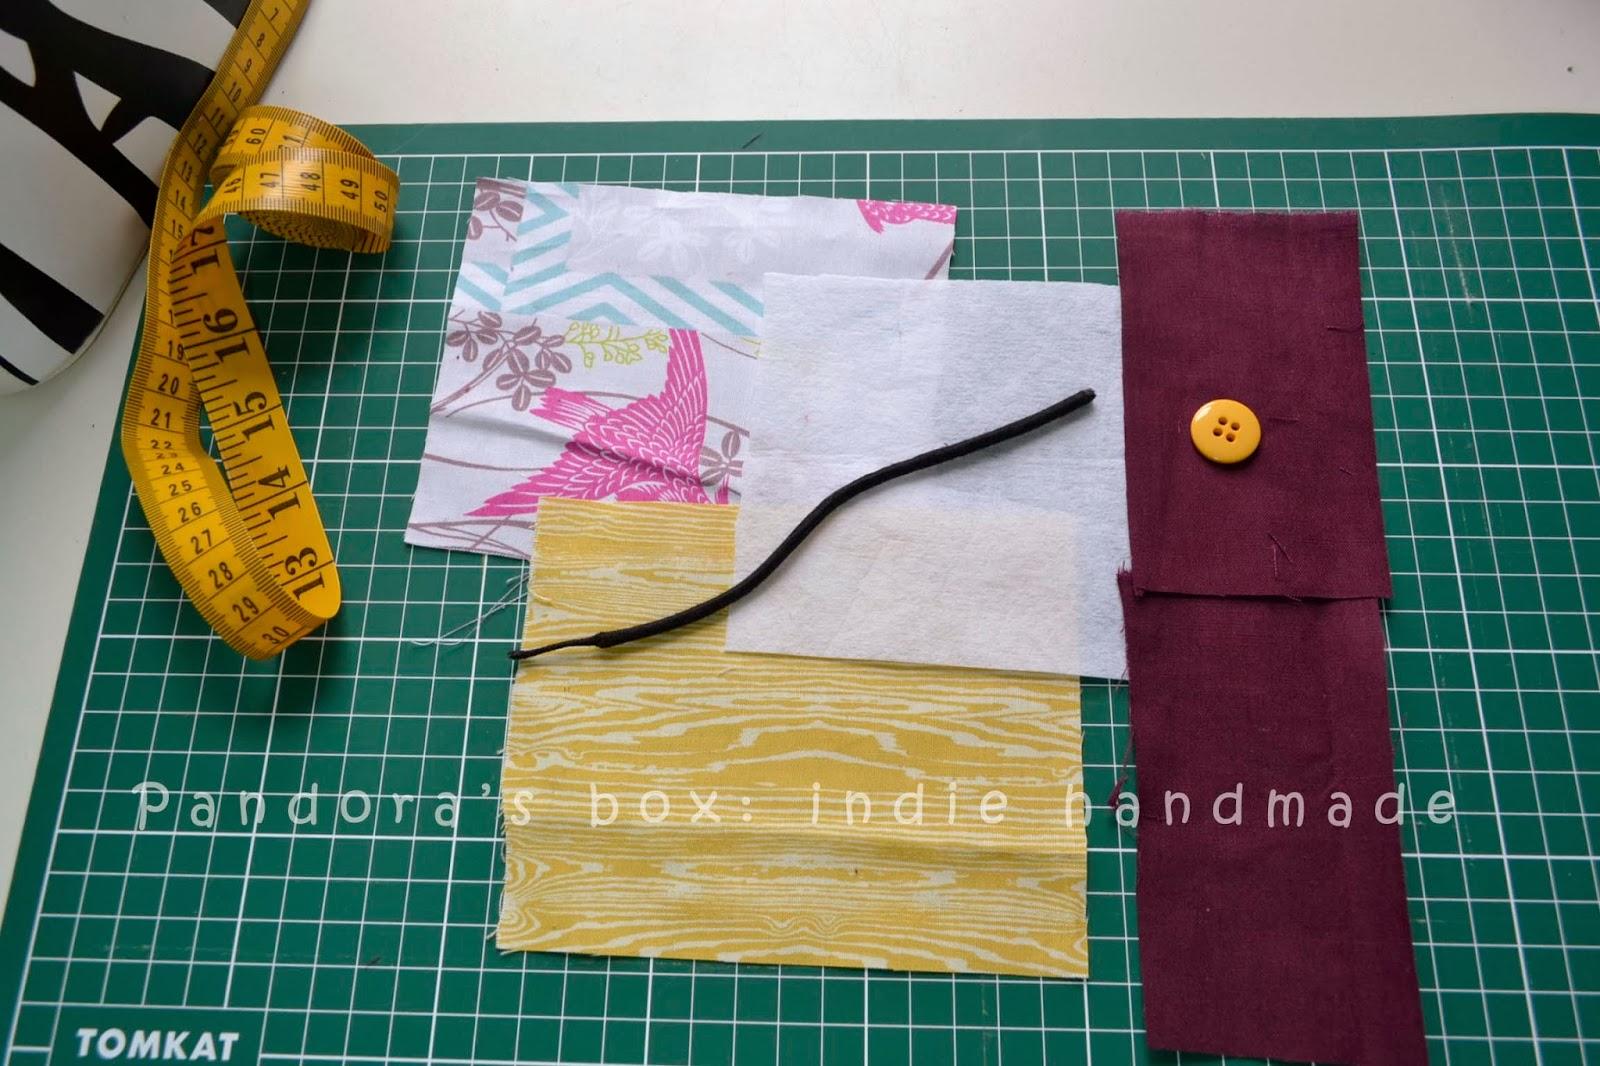 Pandoras box indie handmade easy business card holder tutorial in business card holder tutorial colourmoves